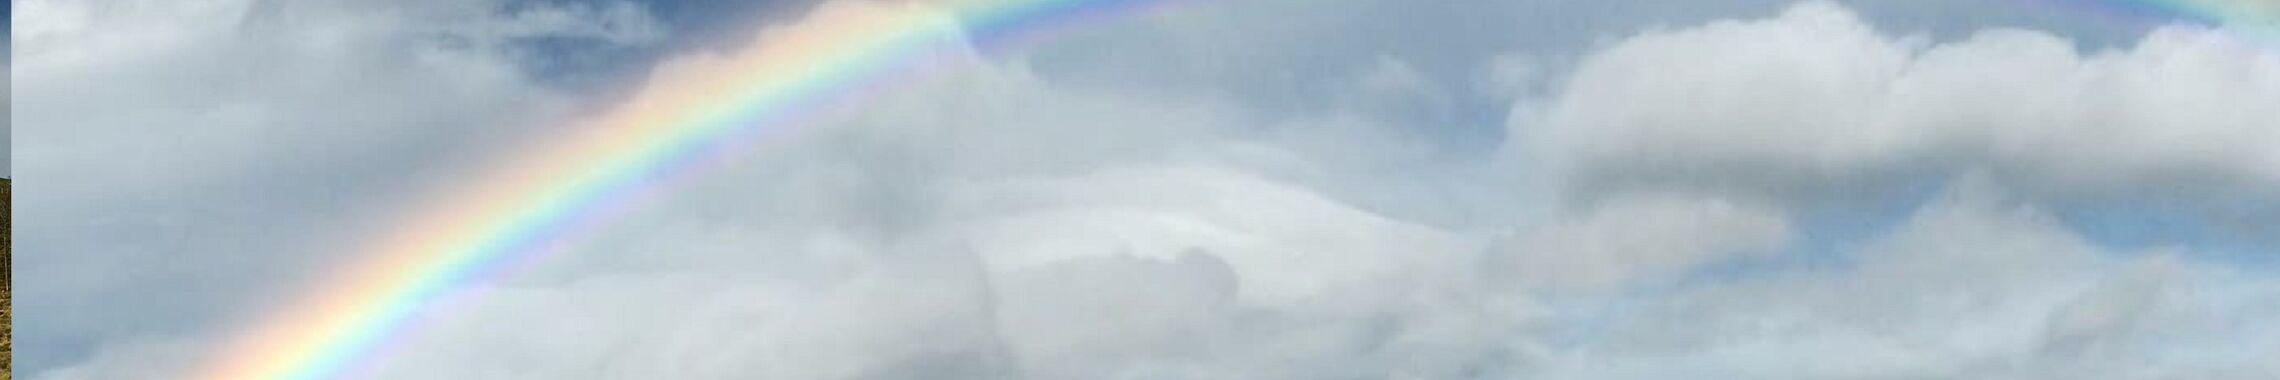 Rainbow-Free-Photo-Pixabay